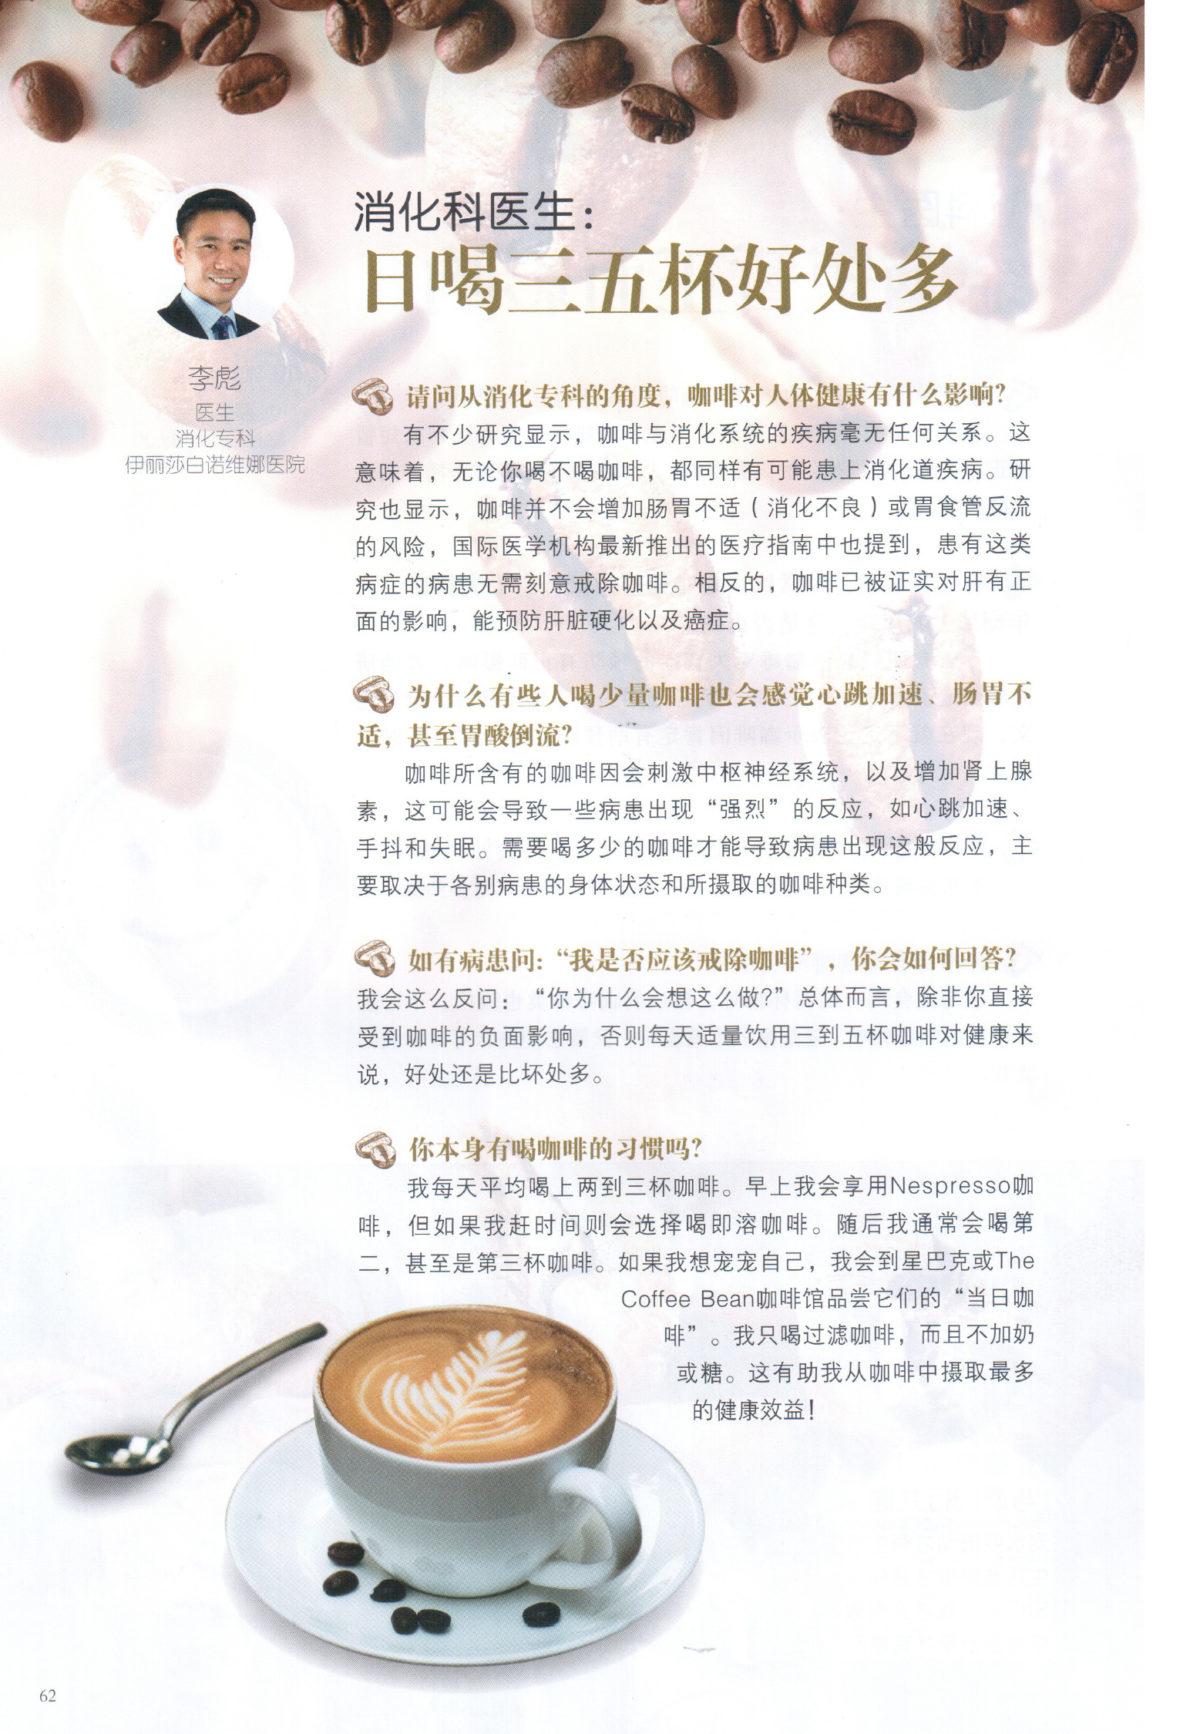 Health-No-1_DrinkingCoffee_Sep-2015-copy-1-1200x1734.jpg